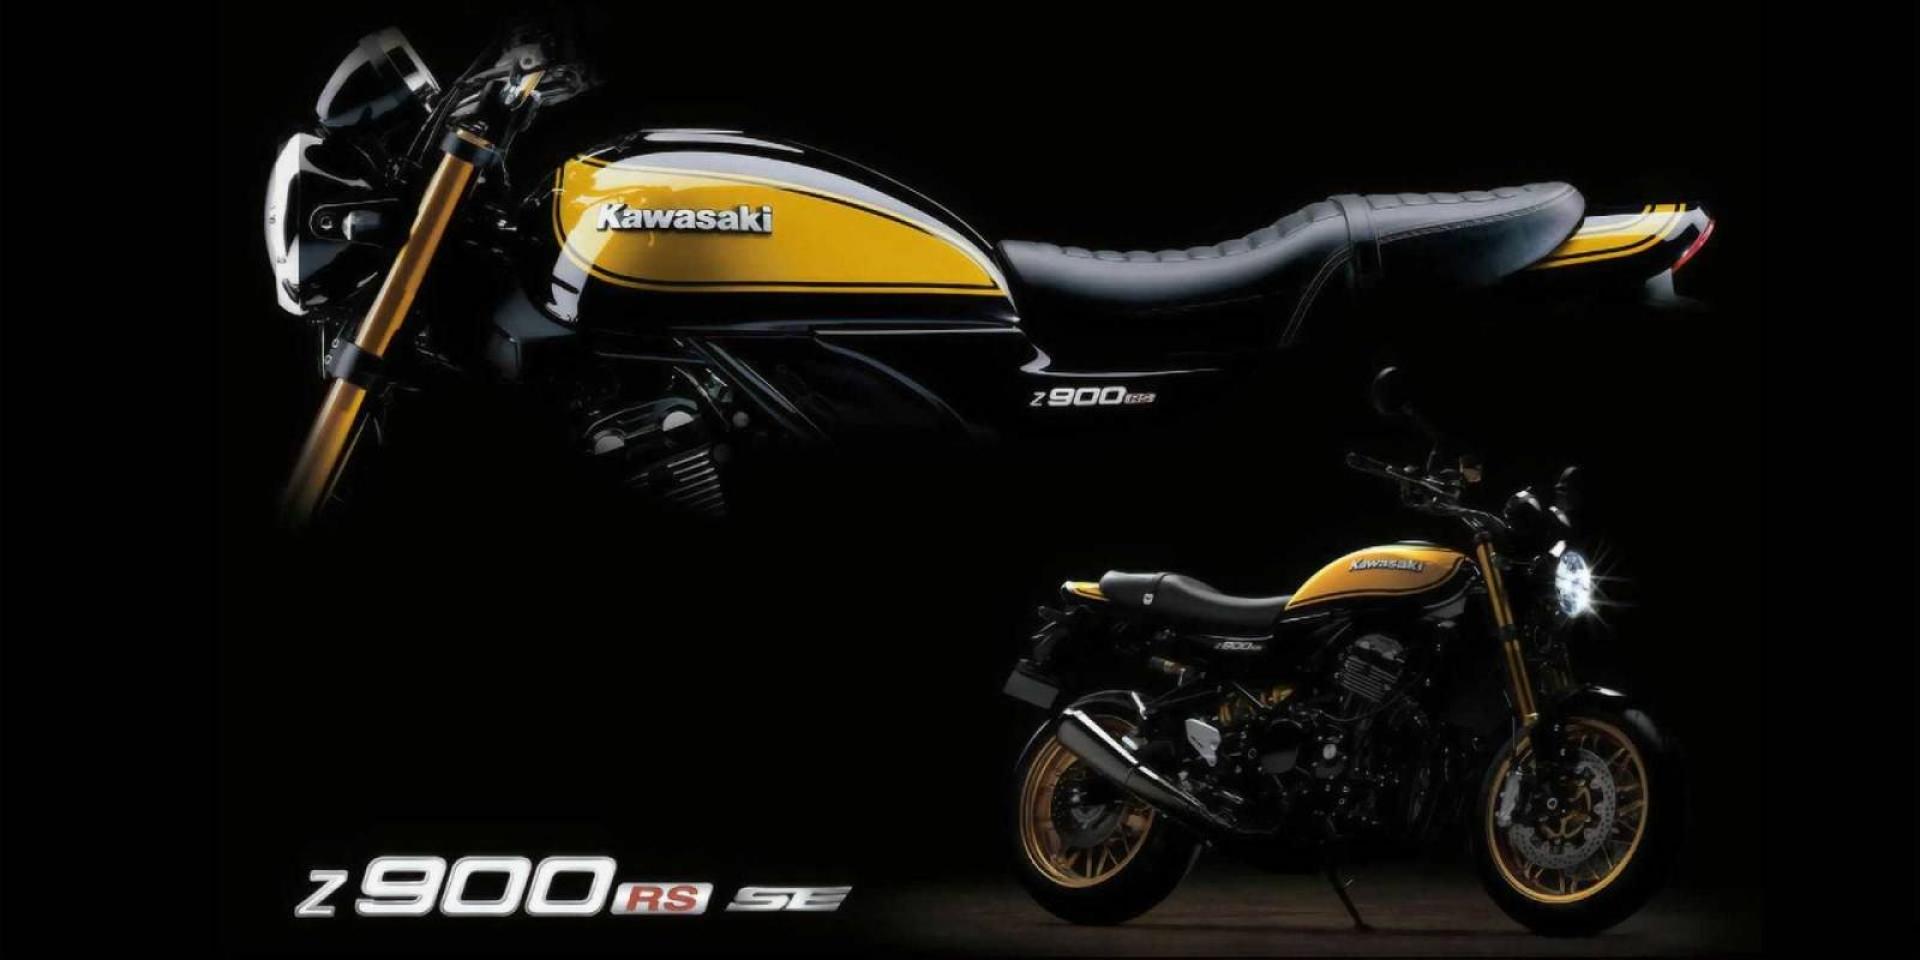 Öhlins懸吊、BREMBO卡鉗、復古塗裝上身!KAWASAKI Z900RS SE 歐洲現身